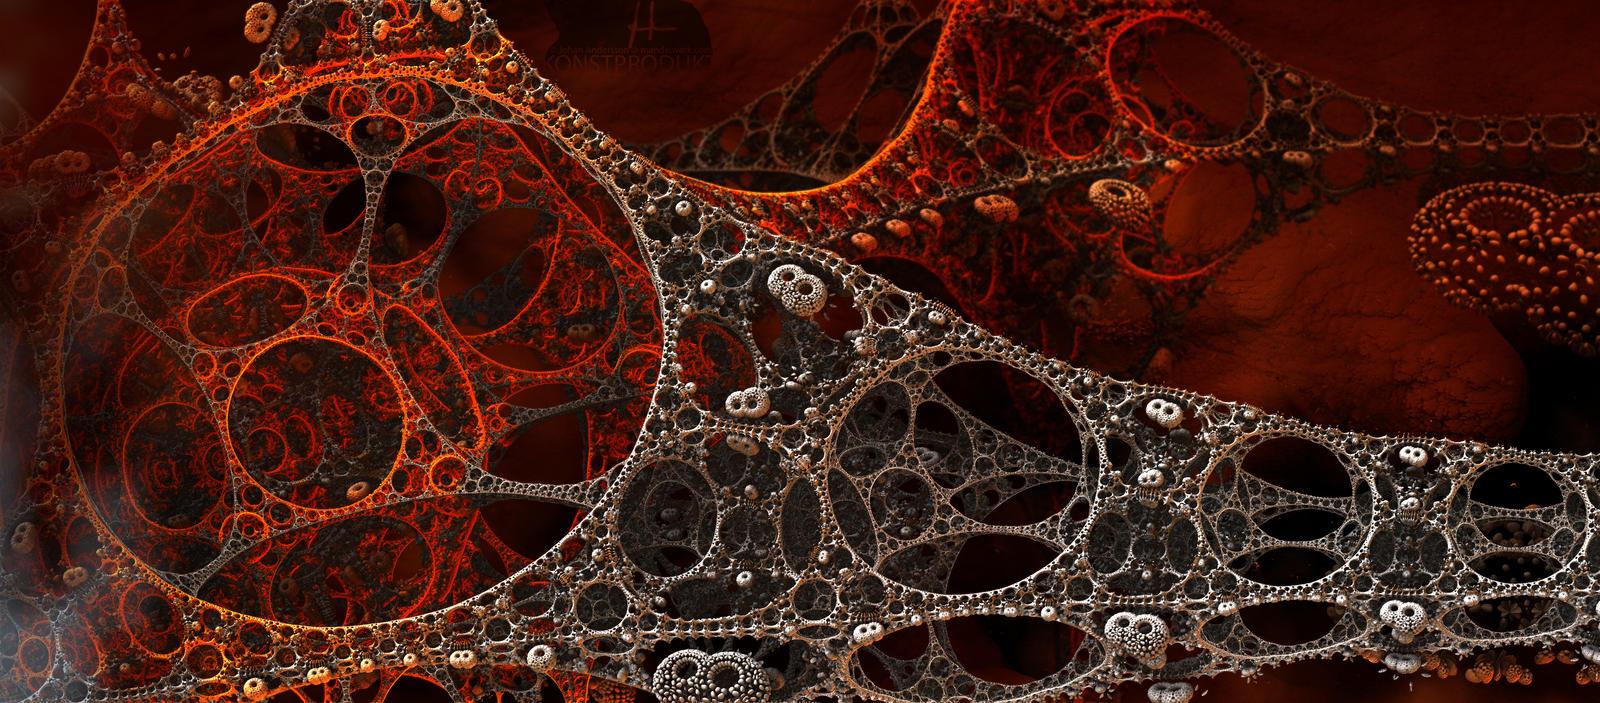 Solar Nervous System by MANDELWERK